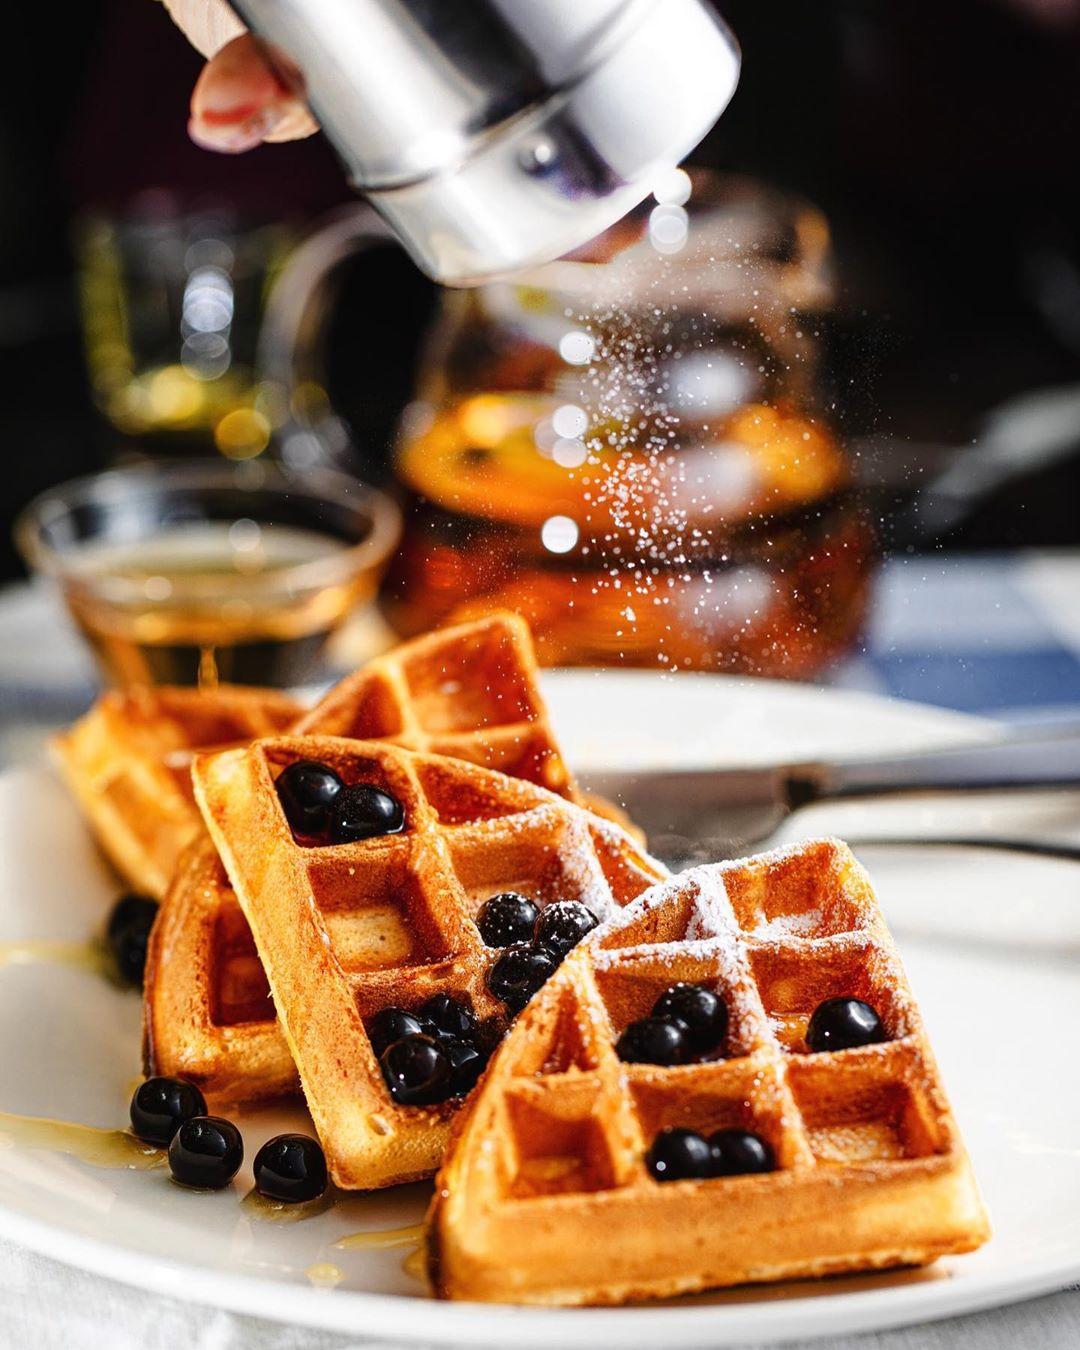 Boba Waffles - Waffles only